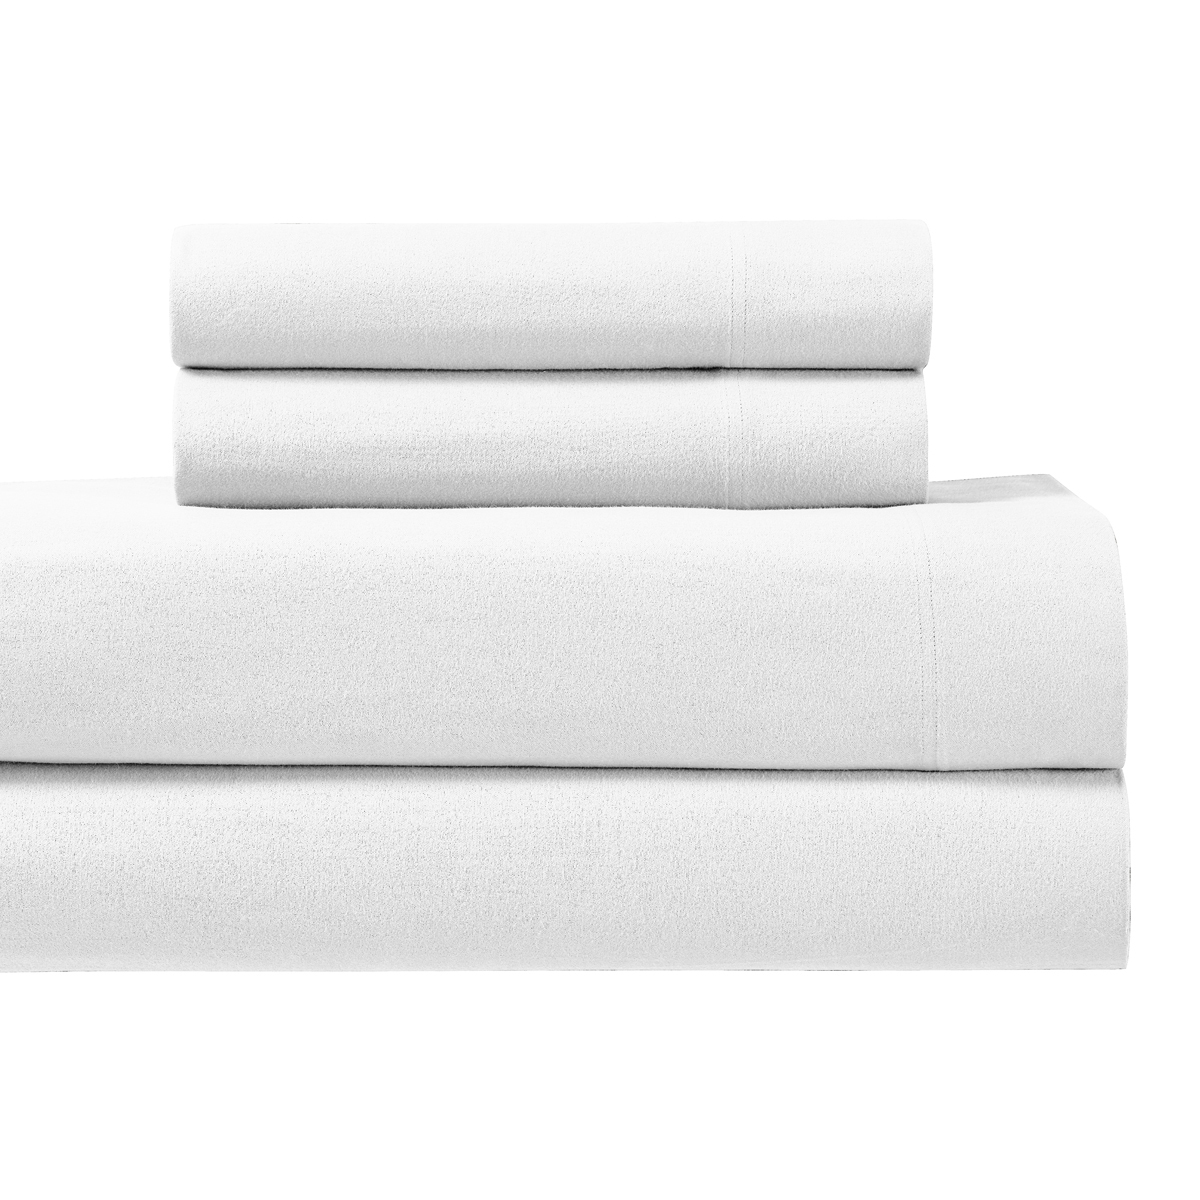 170gsm Heavyweight 100 Cotton Twin Extra Long Twin Xl Flannel Sheets Ultra Soft Warm White Walmart Com Walmart Com